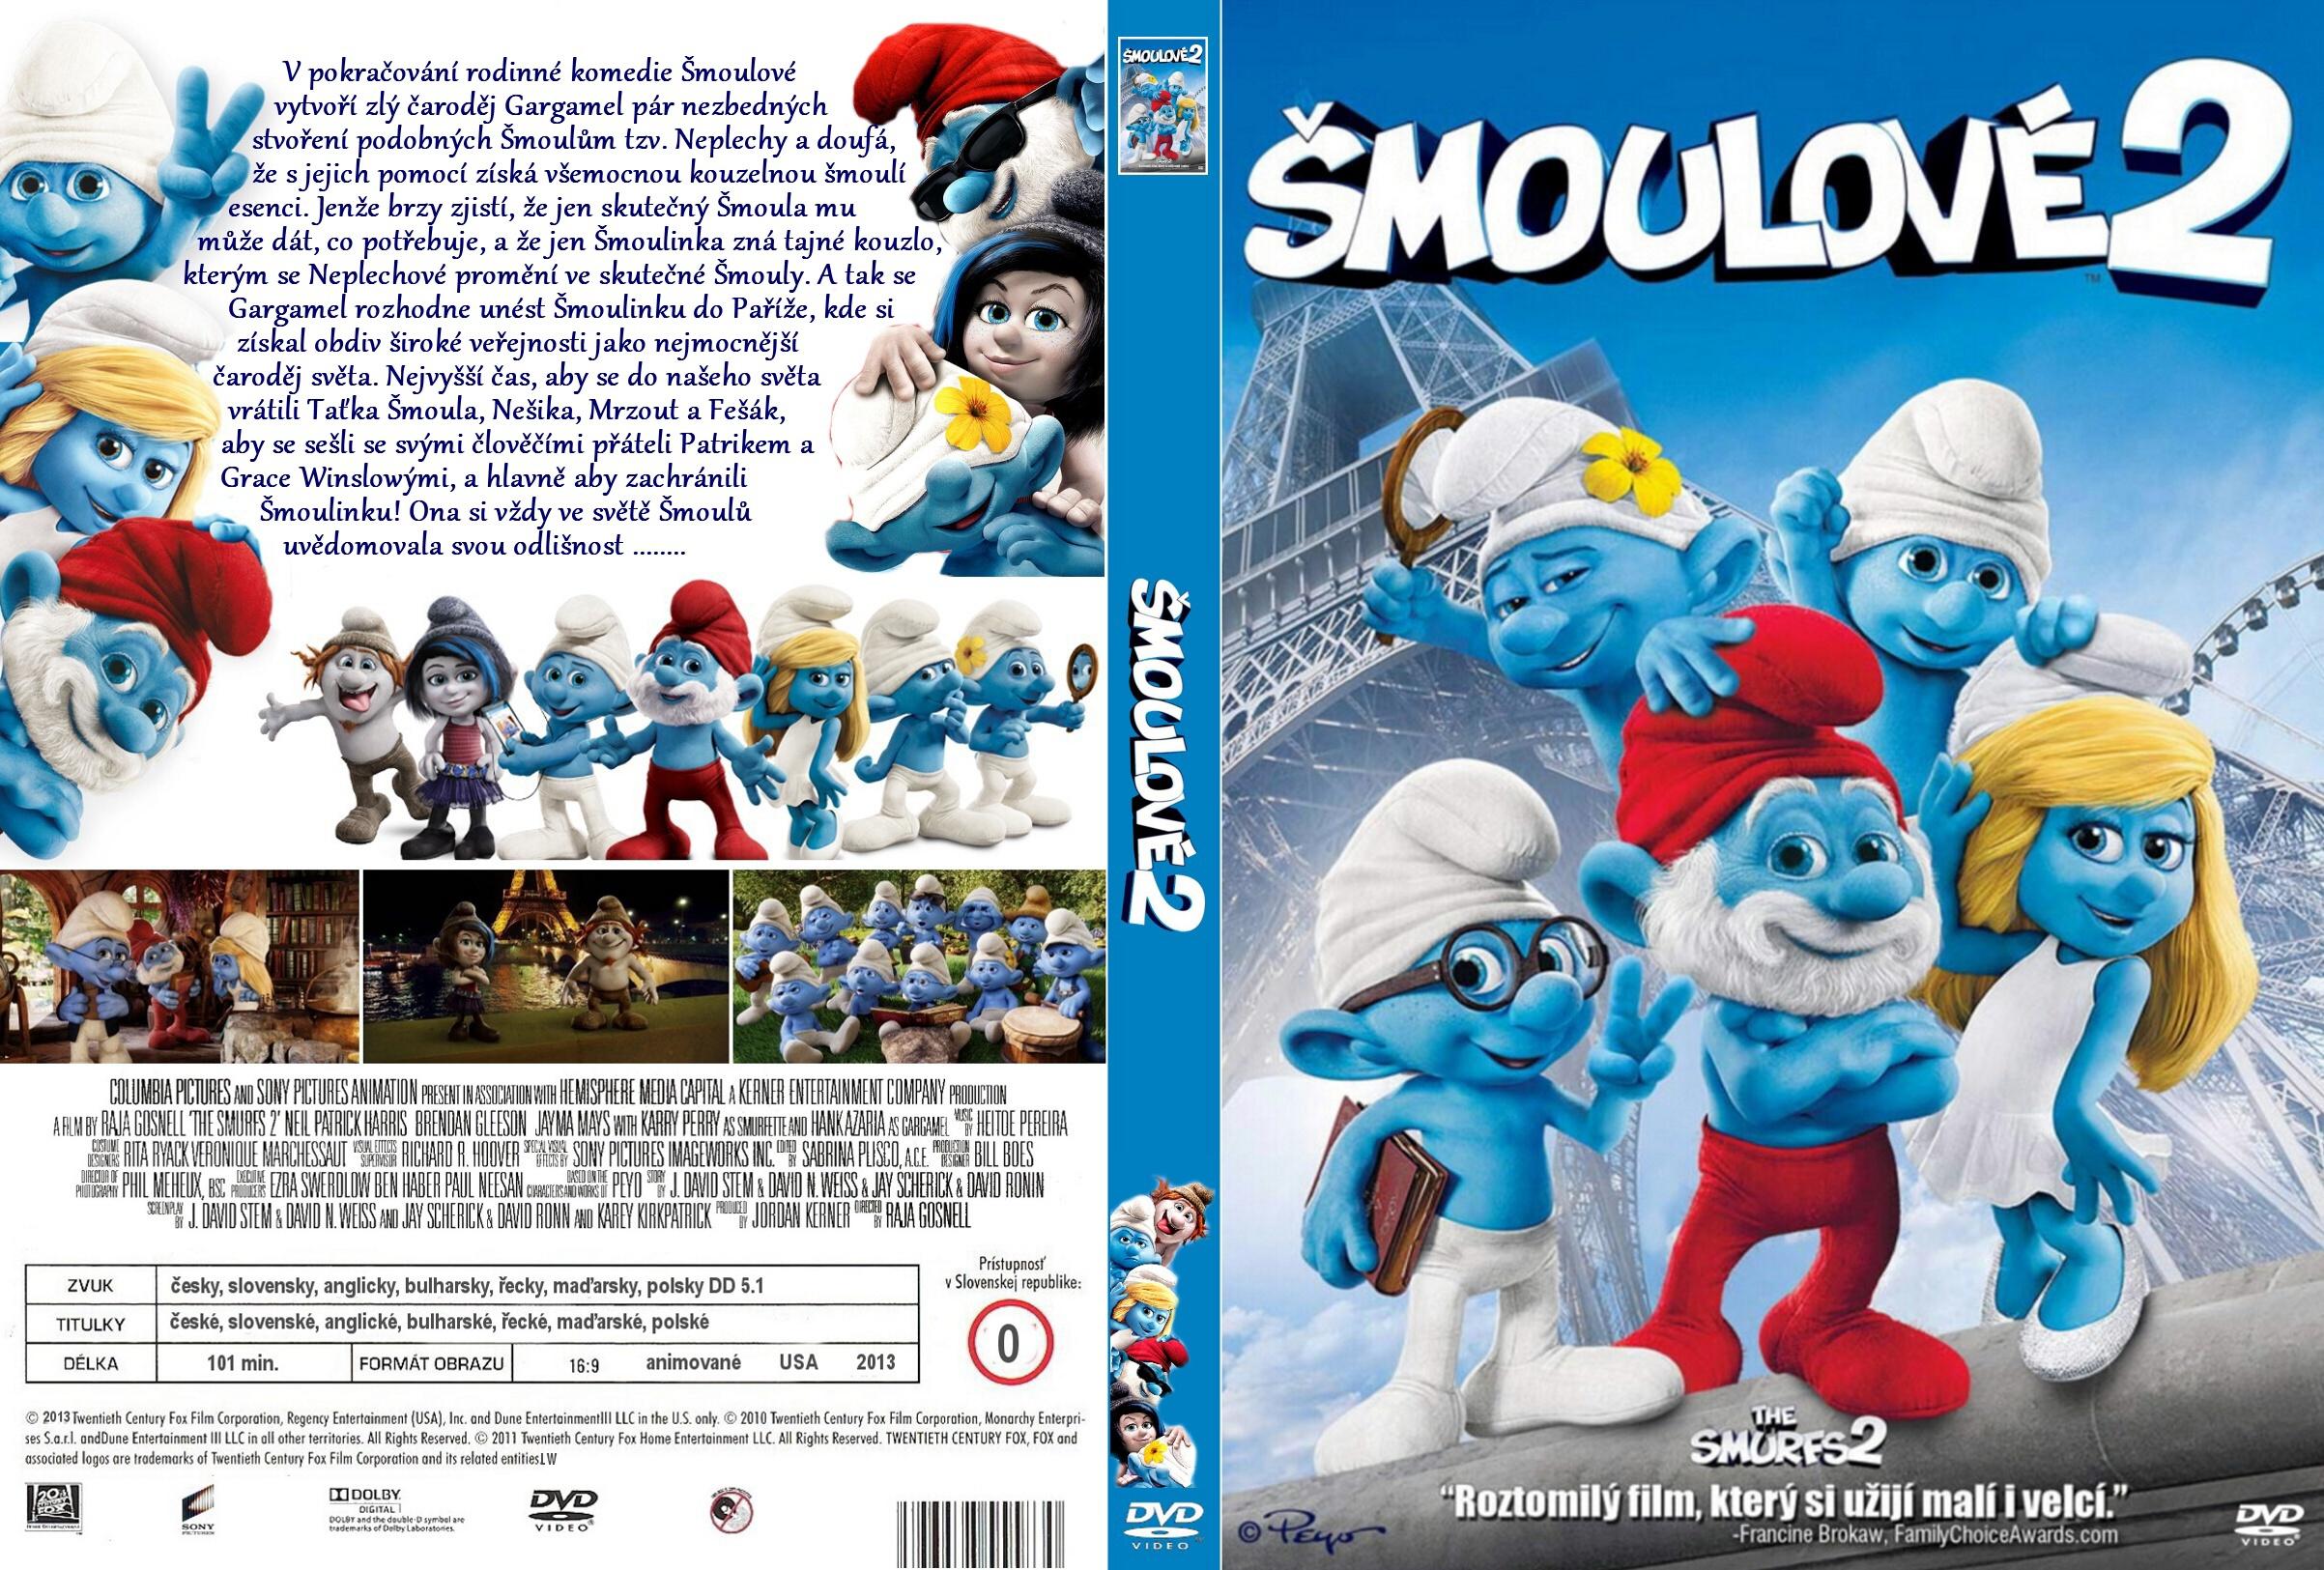 Covers Box Sk The Smurfs 2 2013 High Quality Dvd Blueray Movie